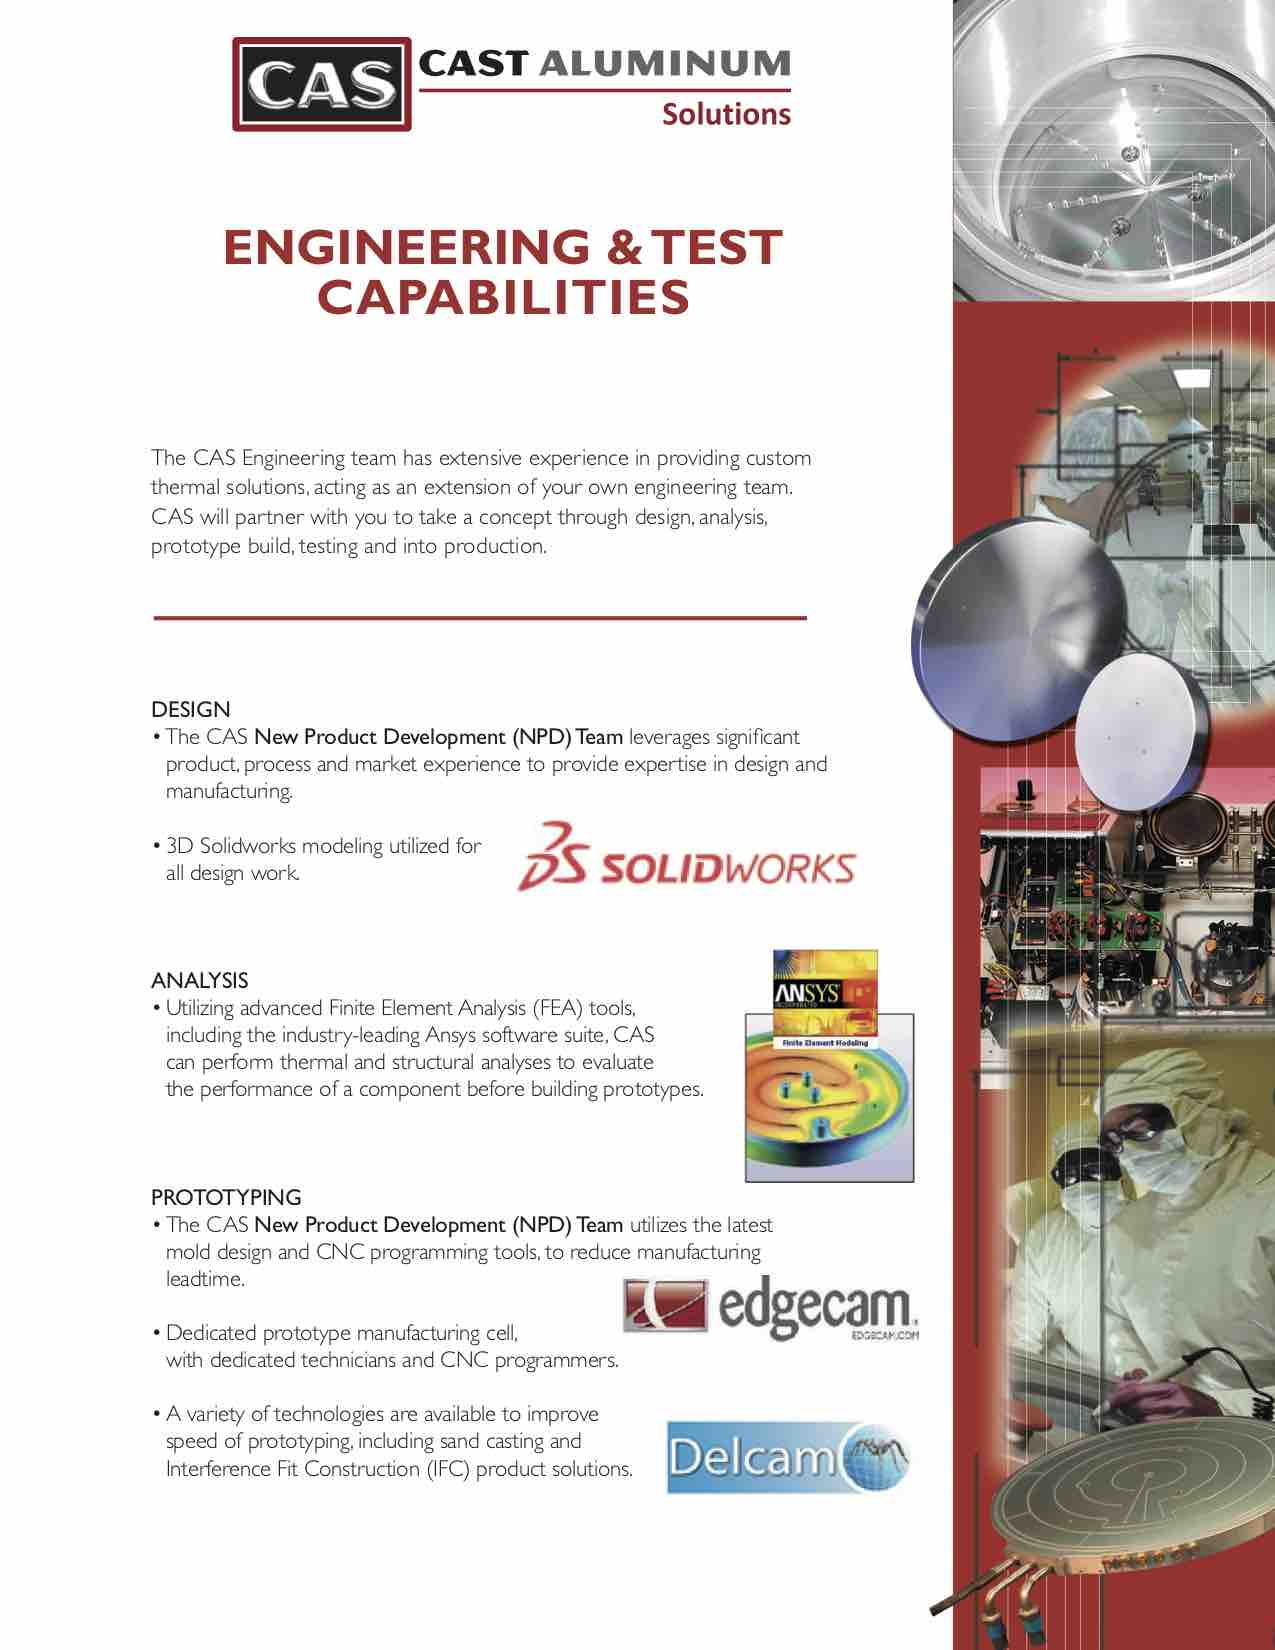 Engineering Capabilities Cast Aluminum Solutions (dragged)